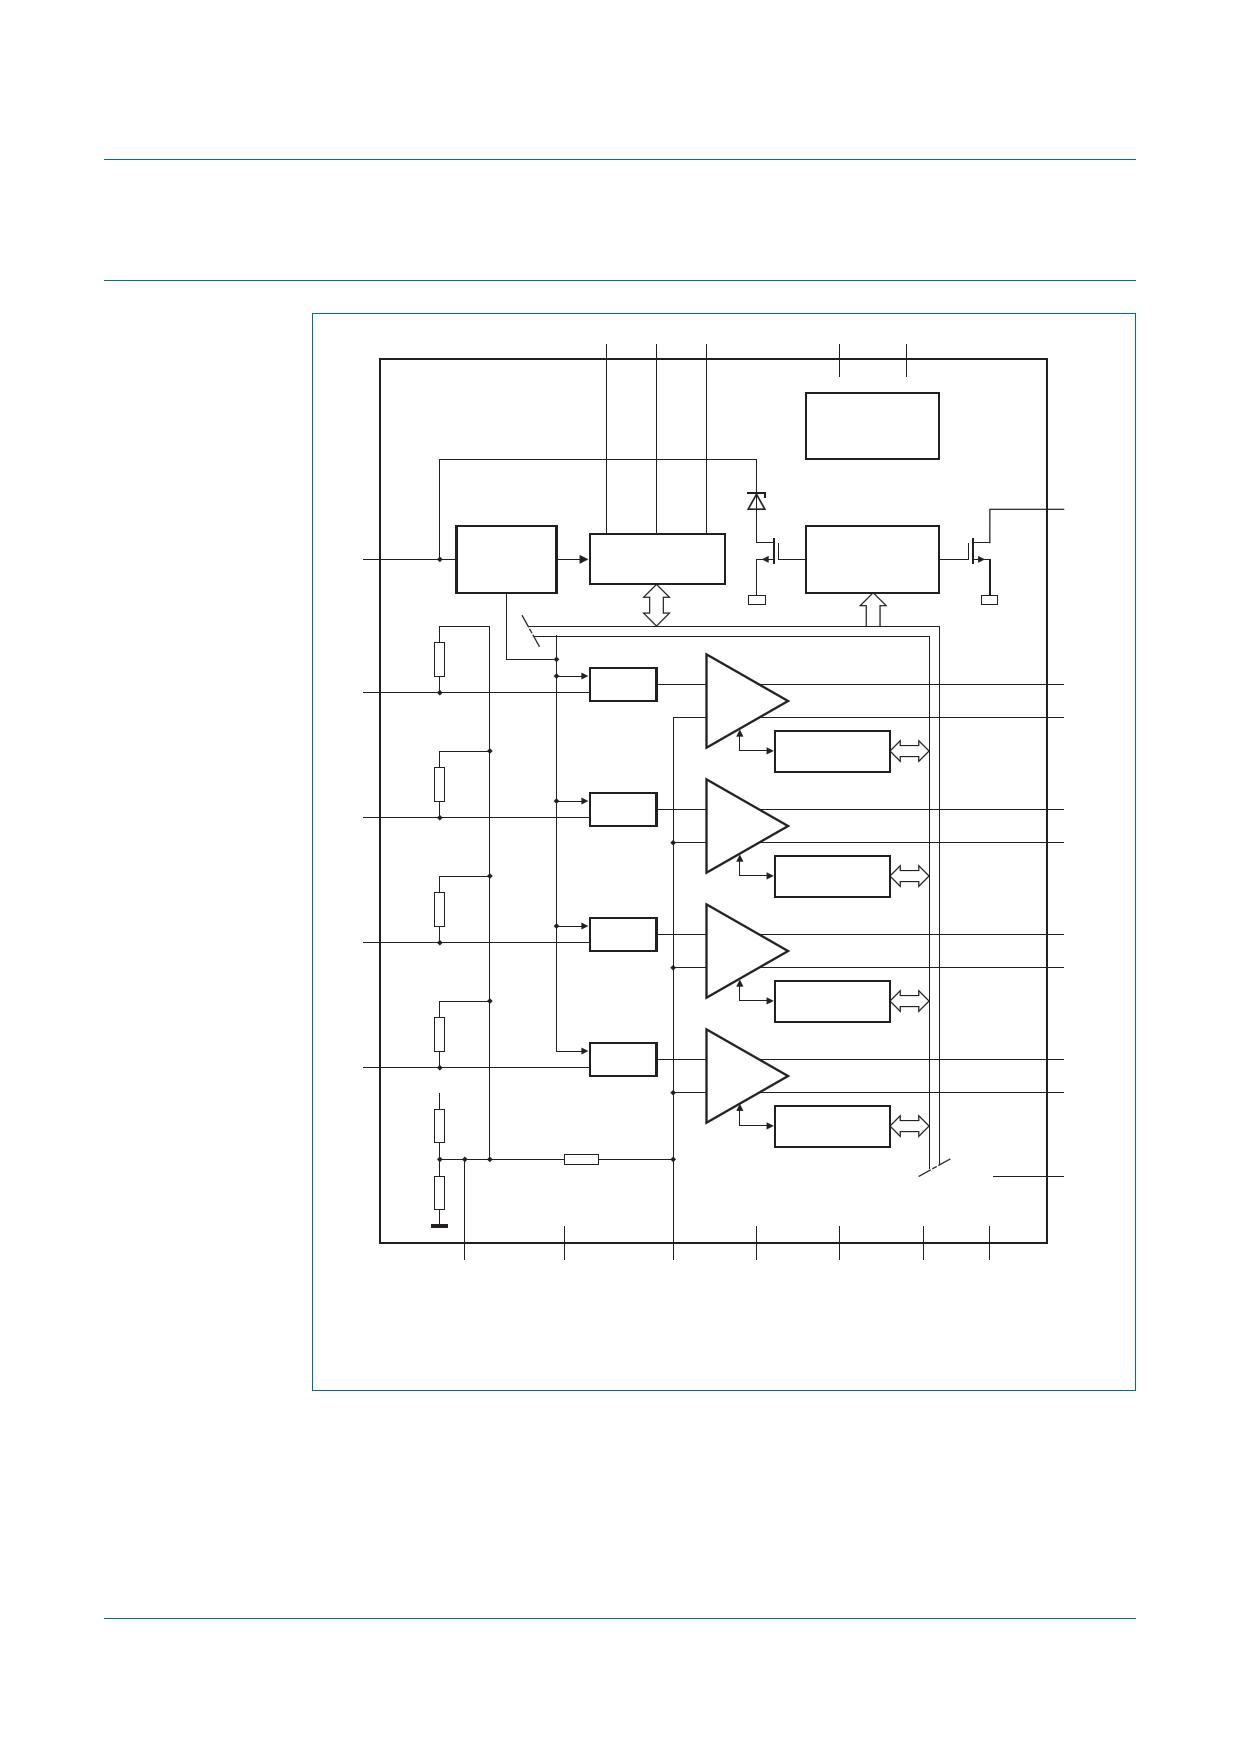 tdf8541  u30c7 u30fc u30bf u30b7 u30fc u30c8 pdf